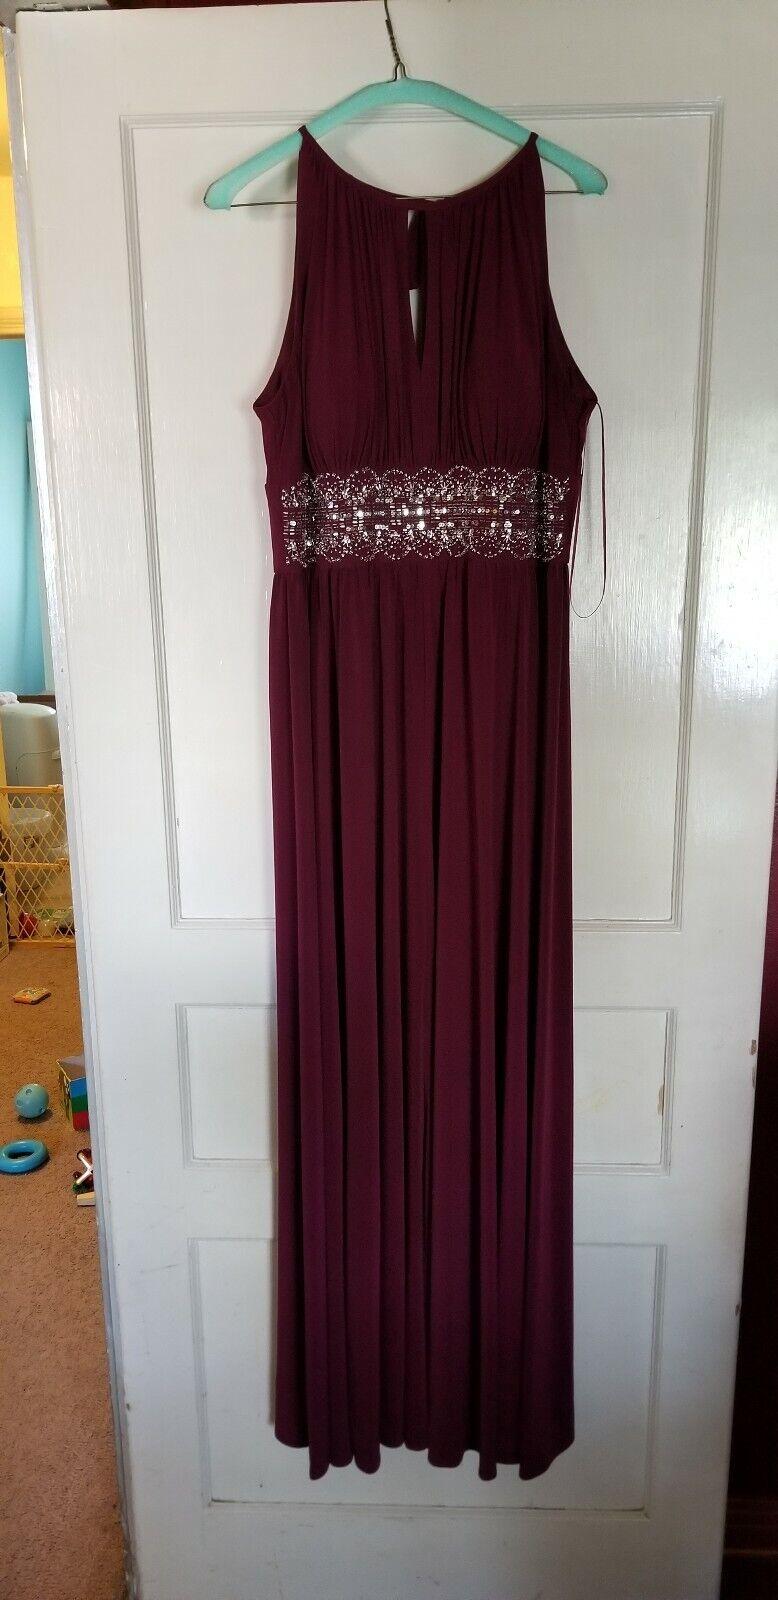 Davids bridal Size 14 Maroon Wedding Prom Dress